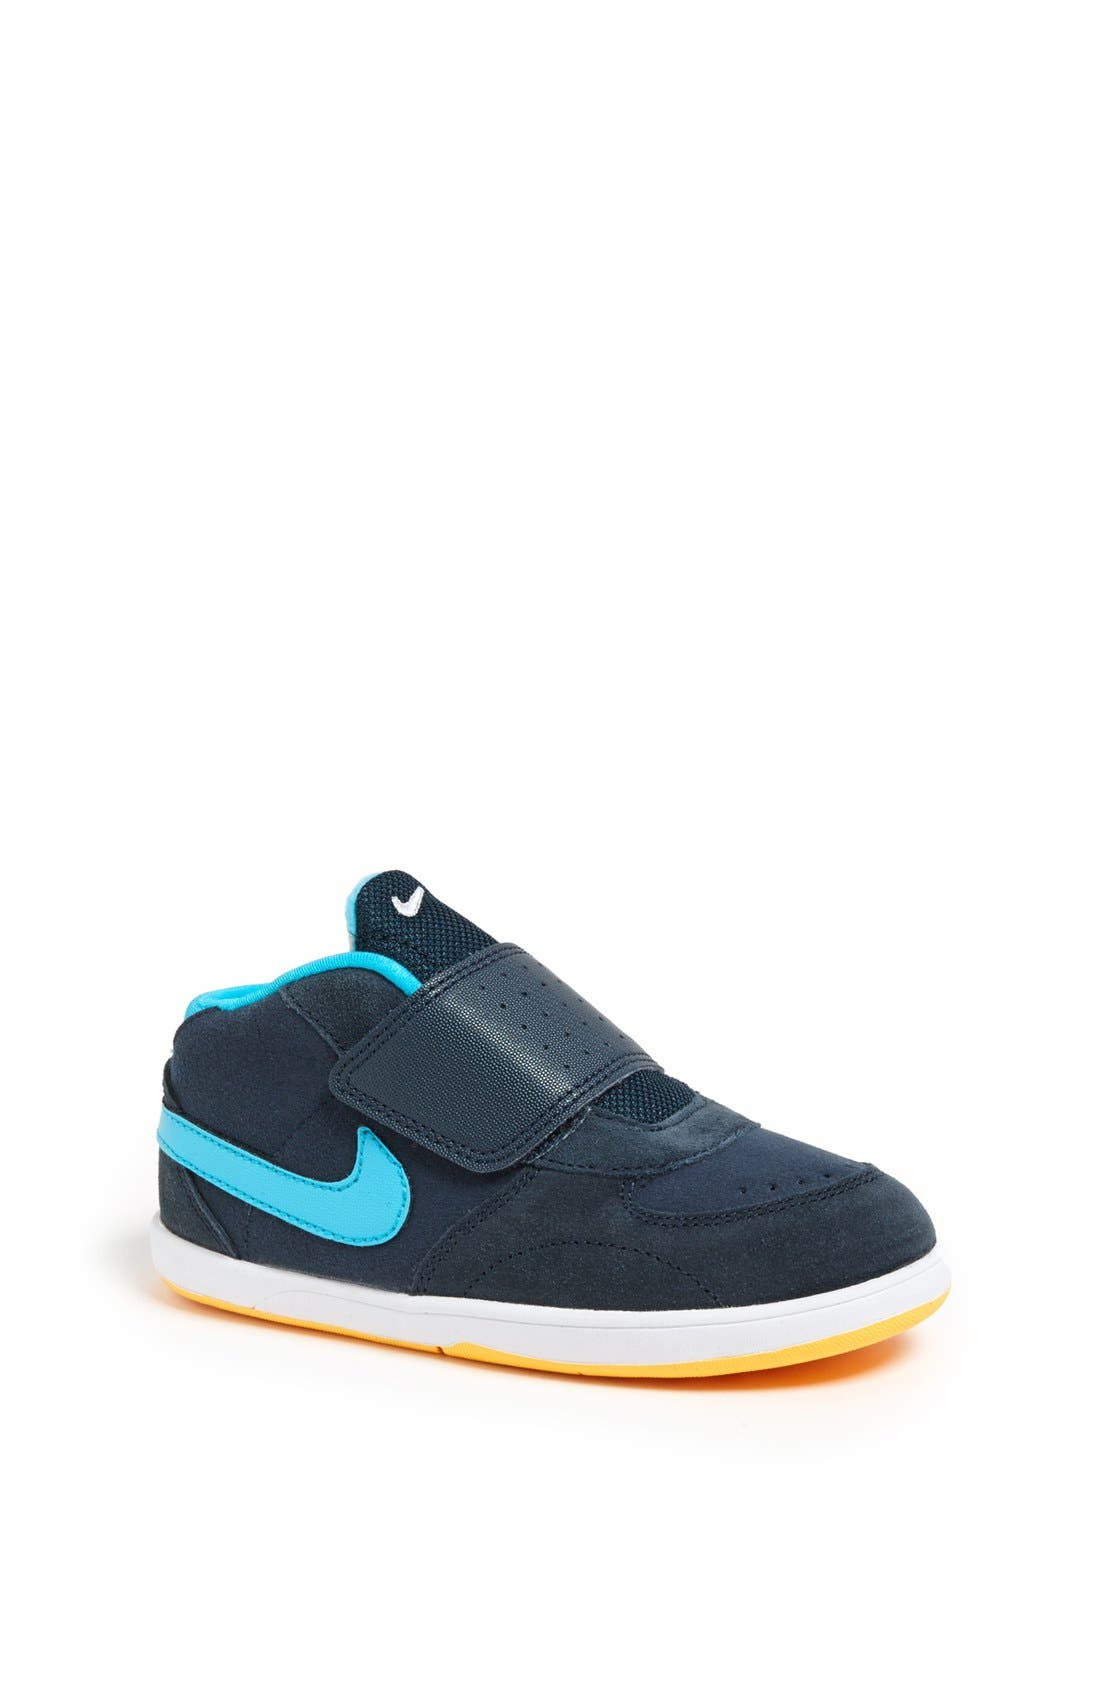 Main Image - Nike 'Mavrk Mid' Athletic Shoe (Baby, Walker & Toddler)